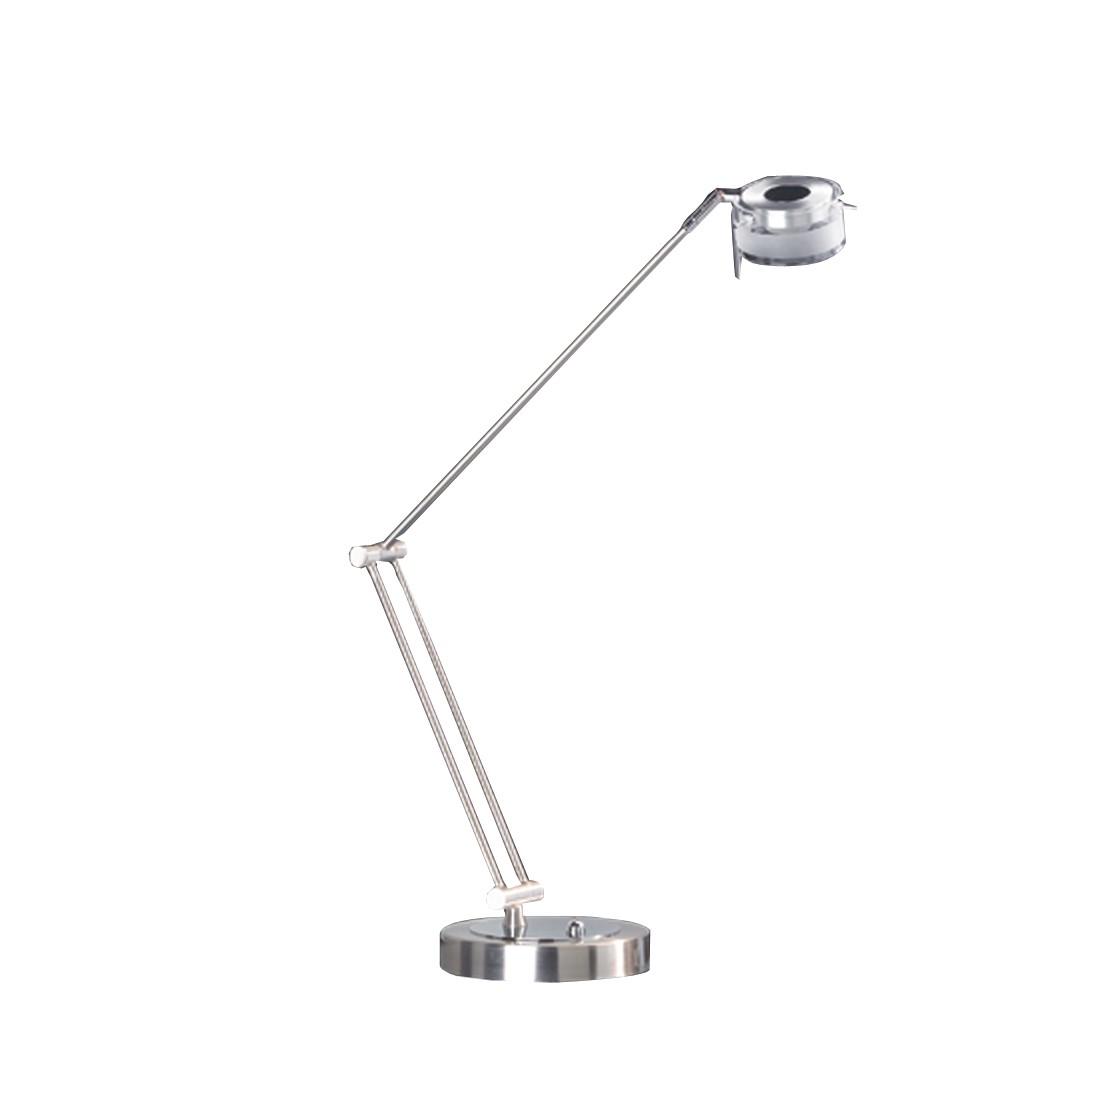 LED-Stehleuchte RIM ● Stahl ● Silber- Paul Neuhaus A+